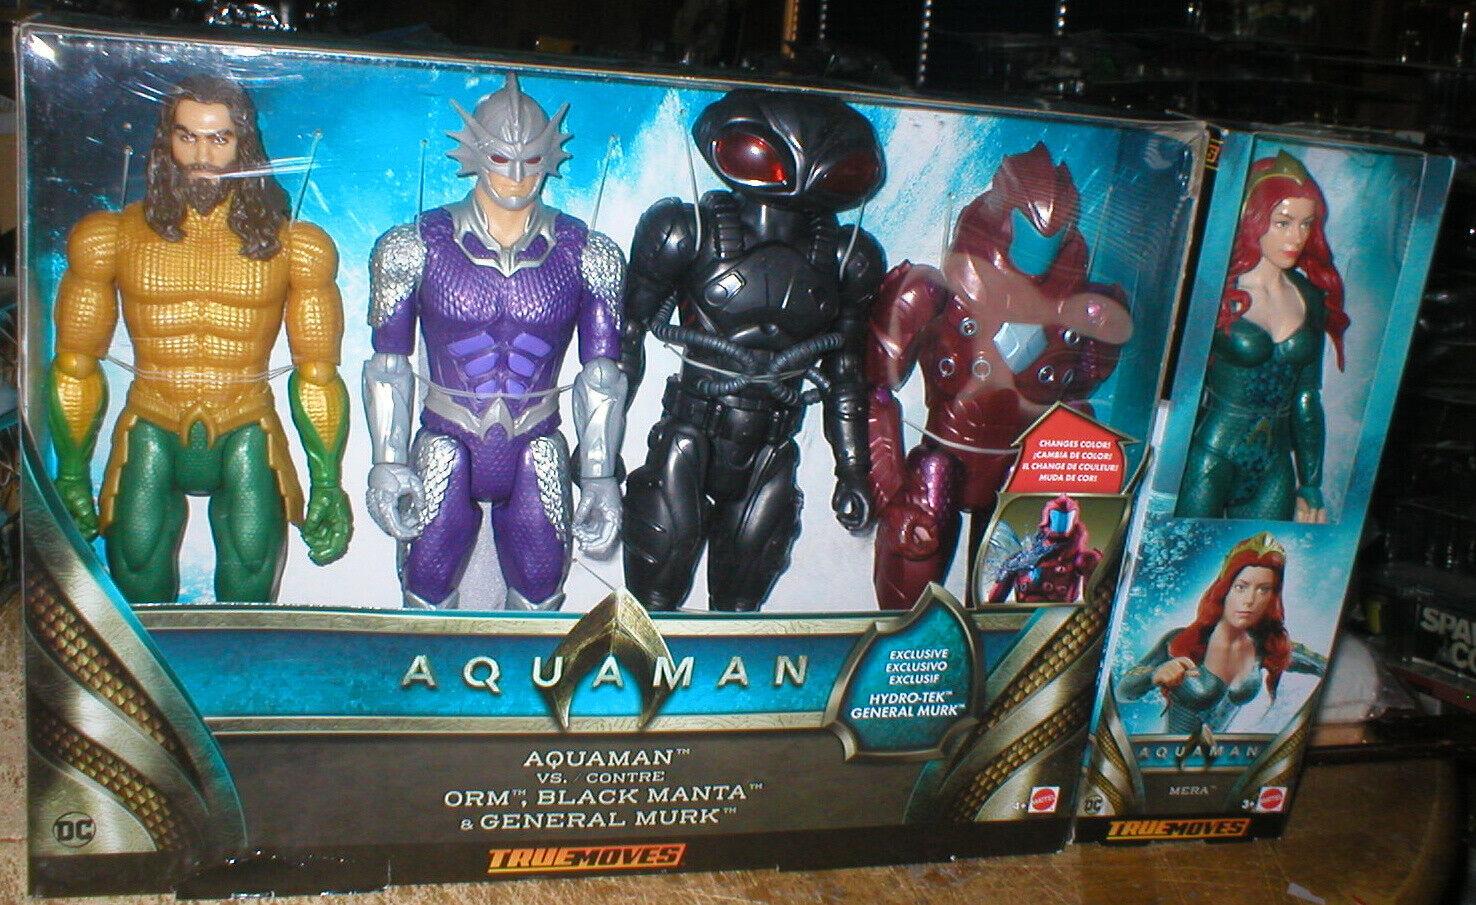 Aquaman película verdadero películas figuras-Aquaman, ORM, nero Manta, Murk & Mera